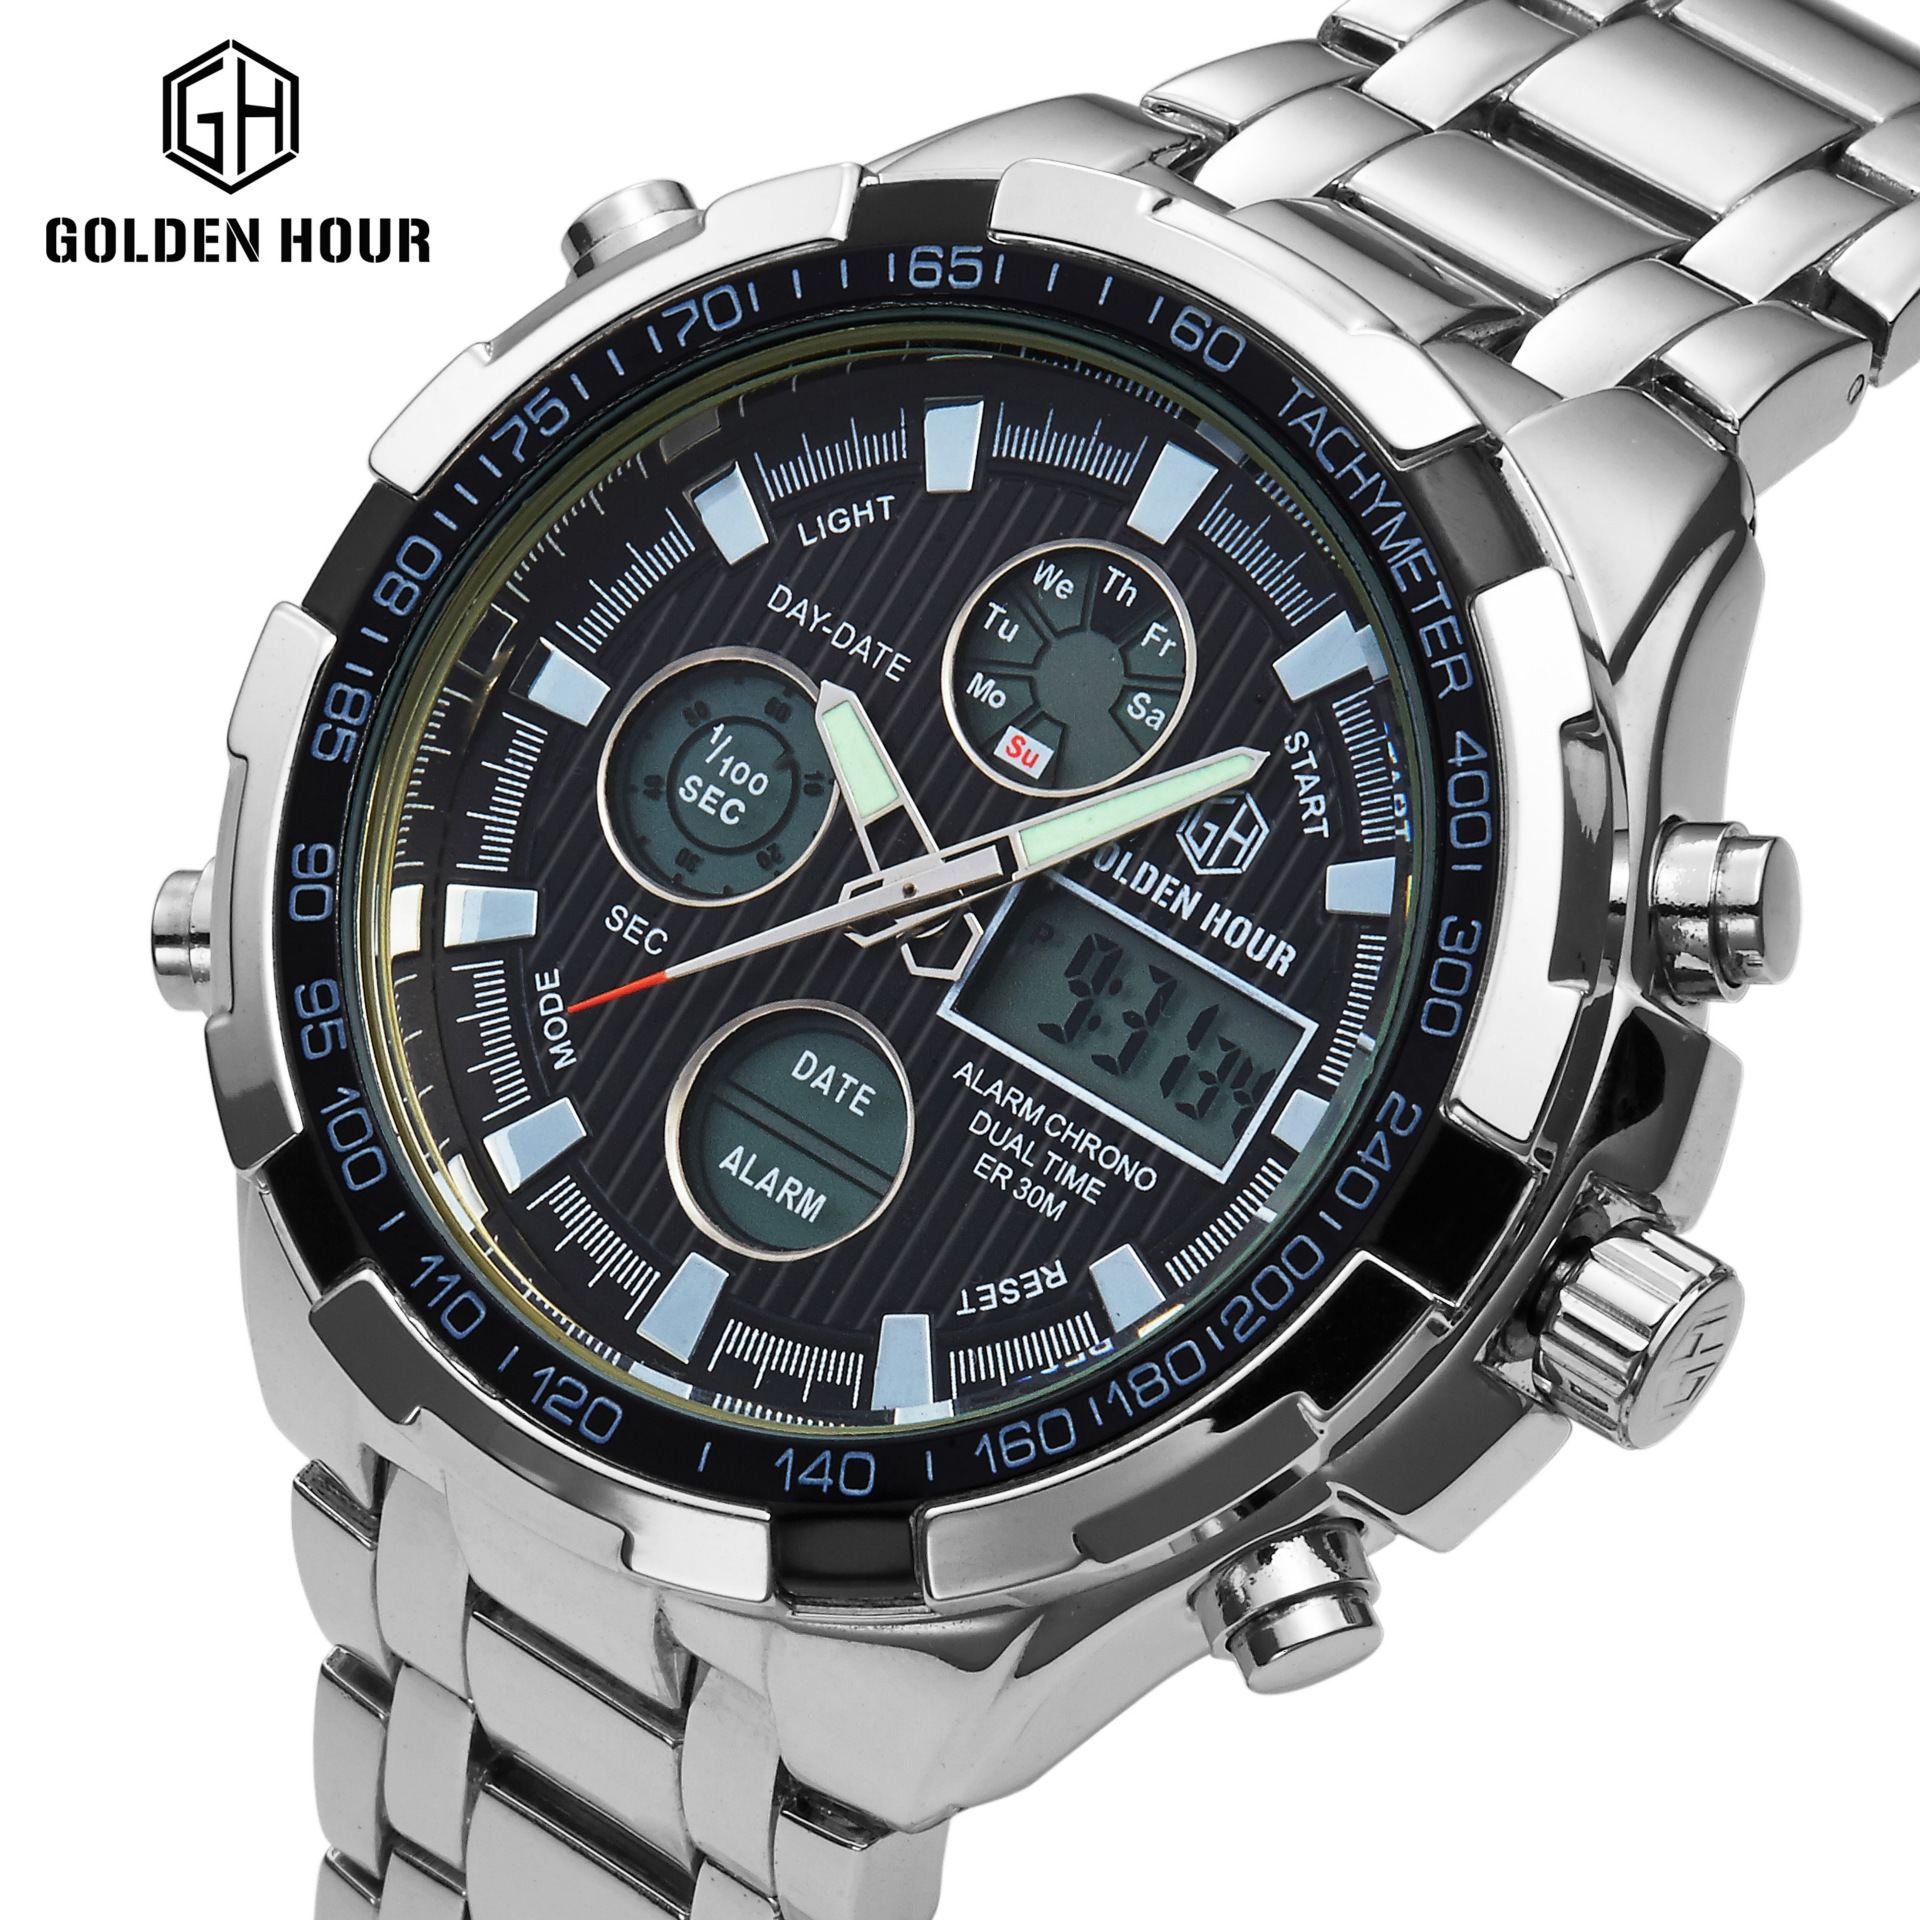 Mens watches top brand luxury Gold full Steel Dress Quartz Watch Luminous Hands Multifunctional Wristwatches dz watches for men